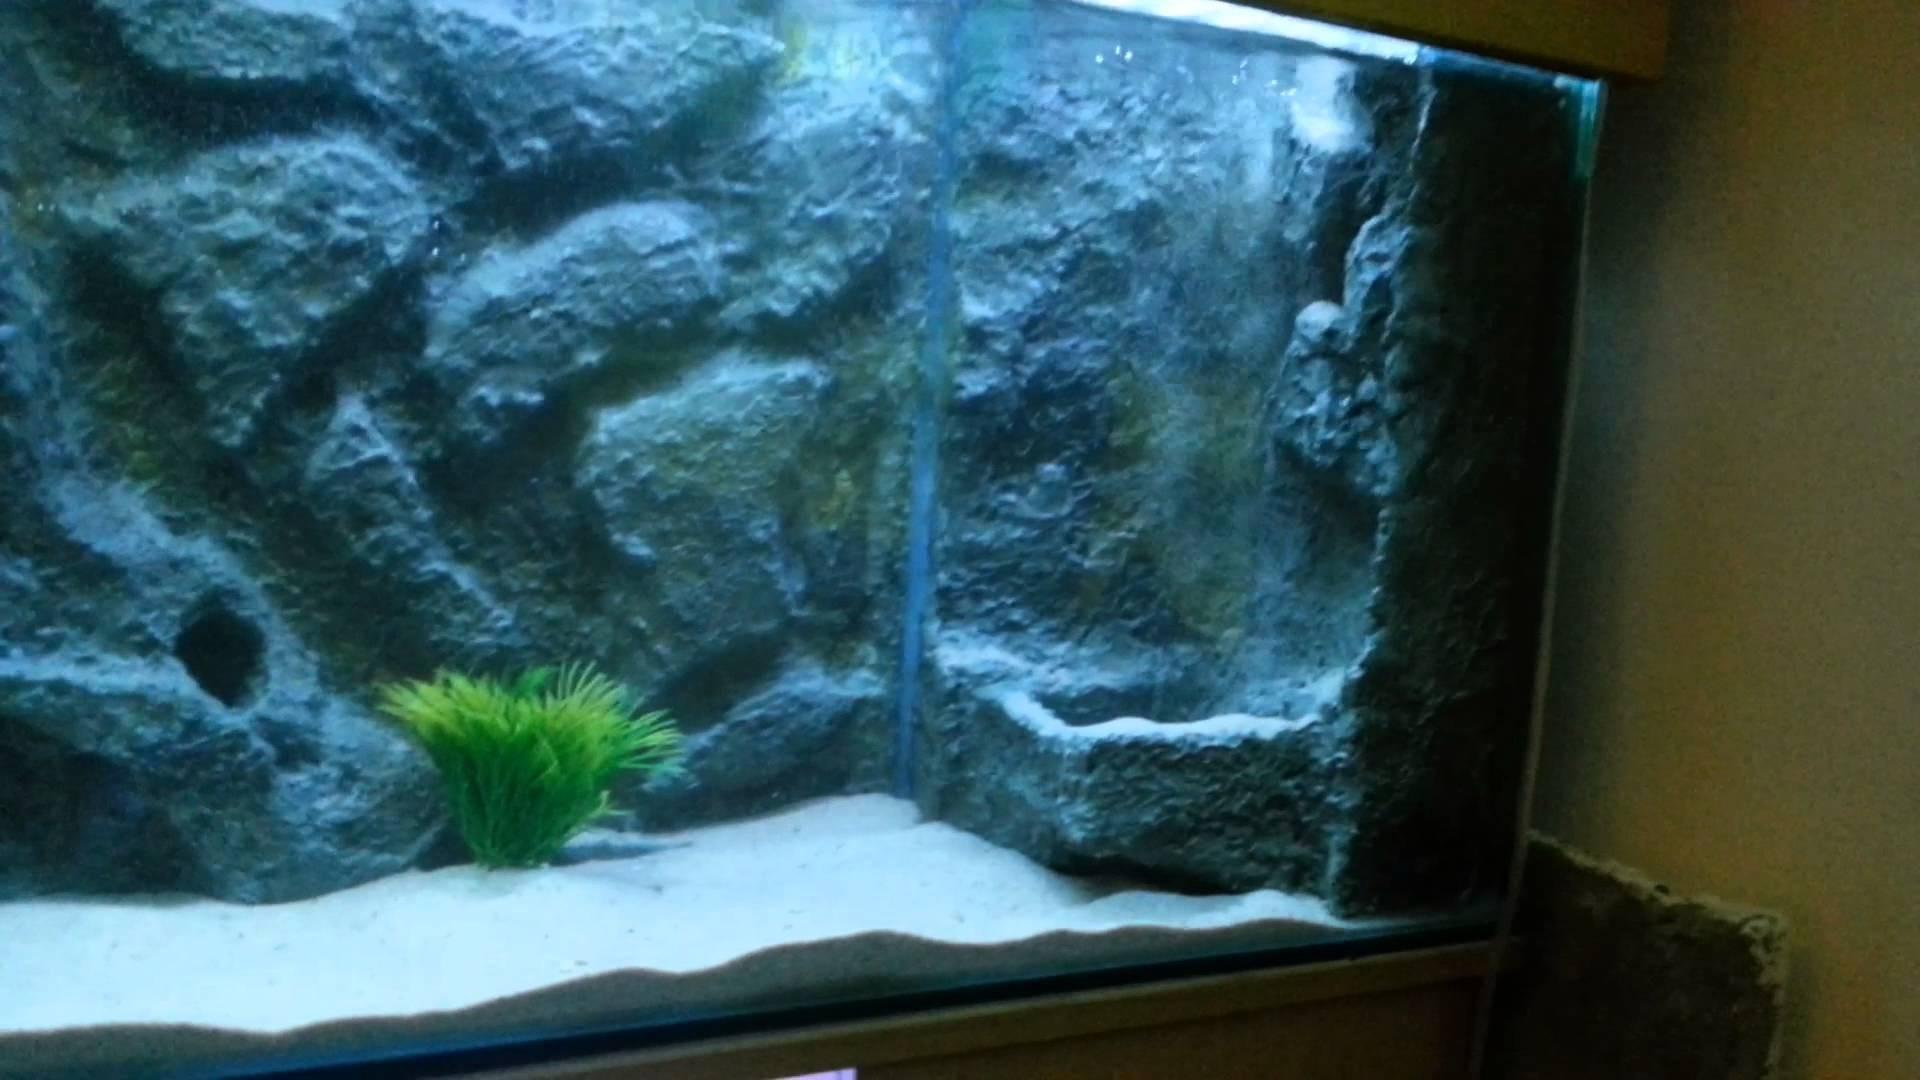 3d Designs Wallpaper Hd Aquarium Background 183 ① Download Free Wallpapers For